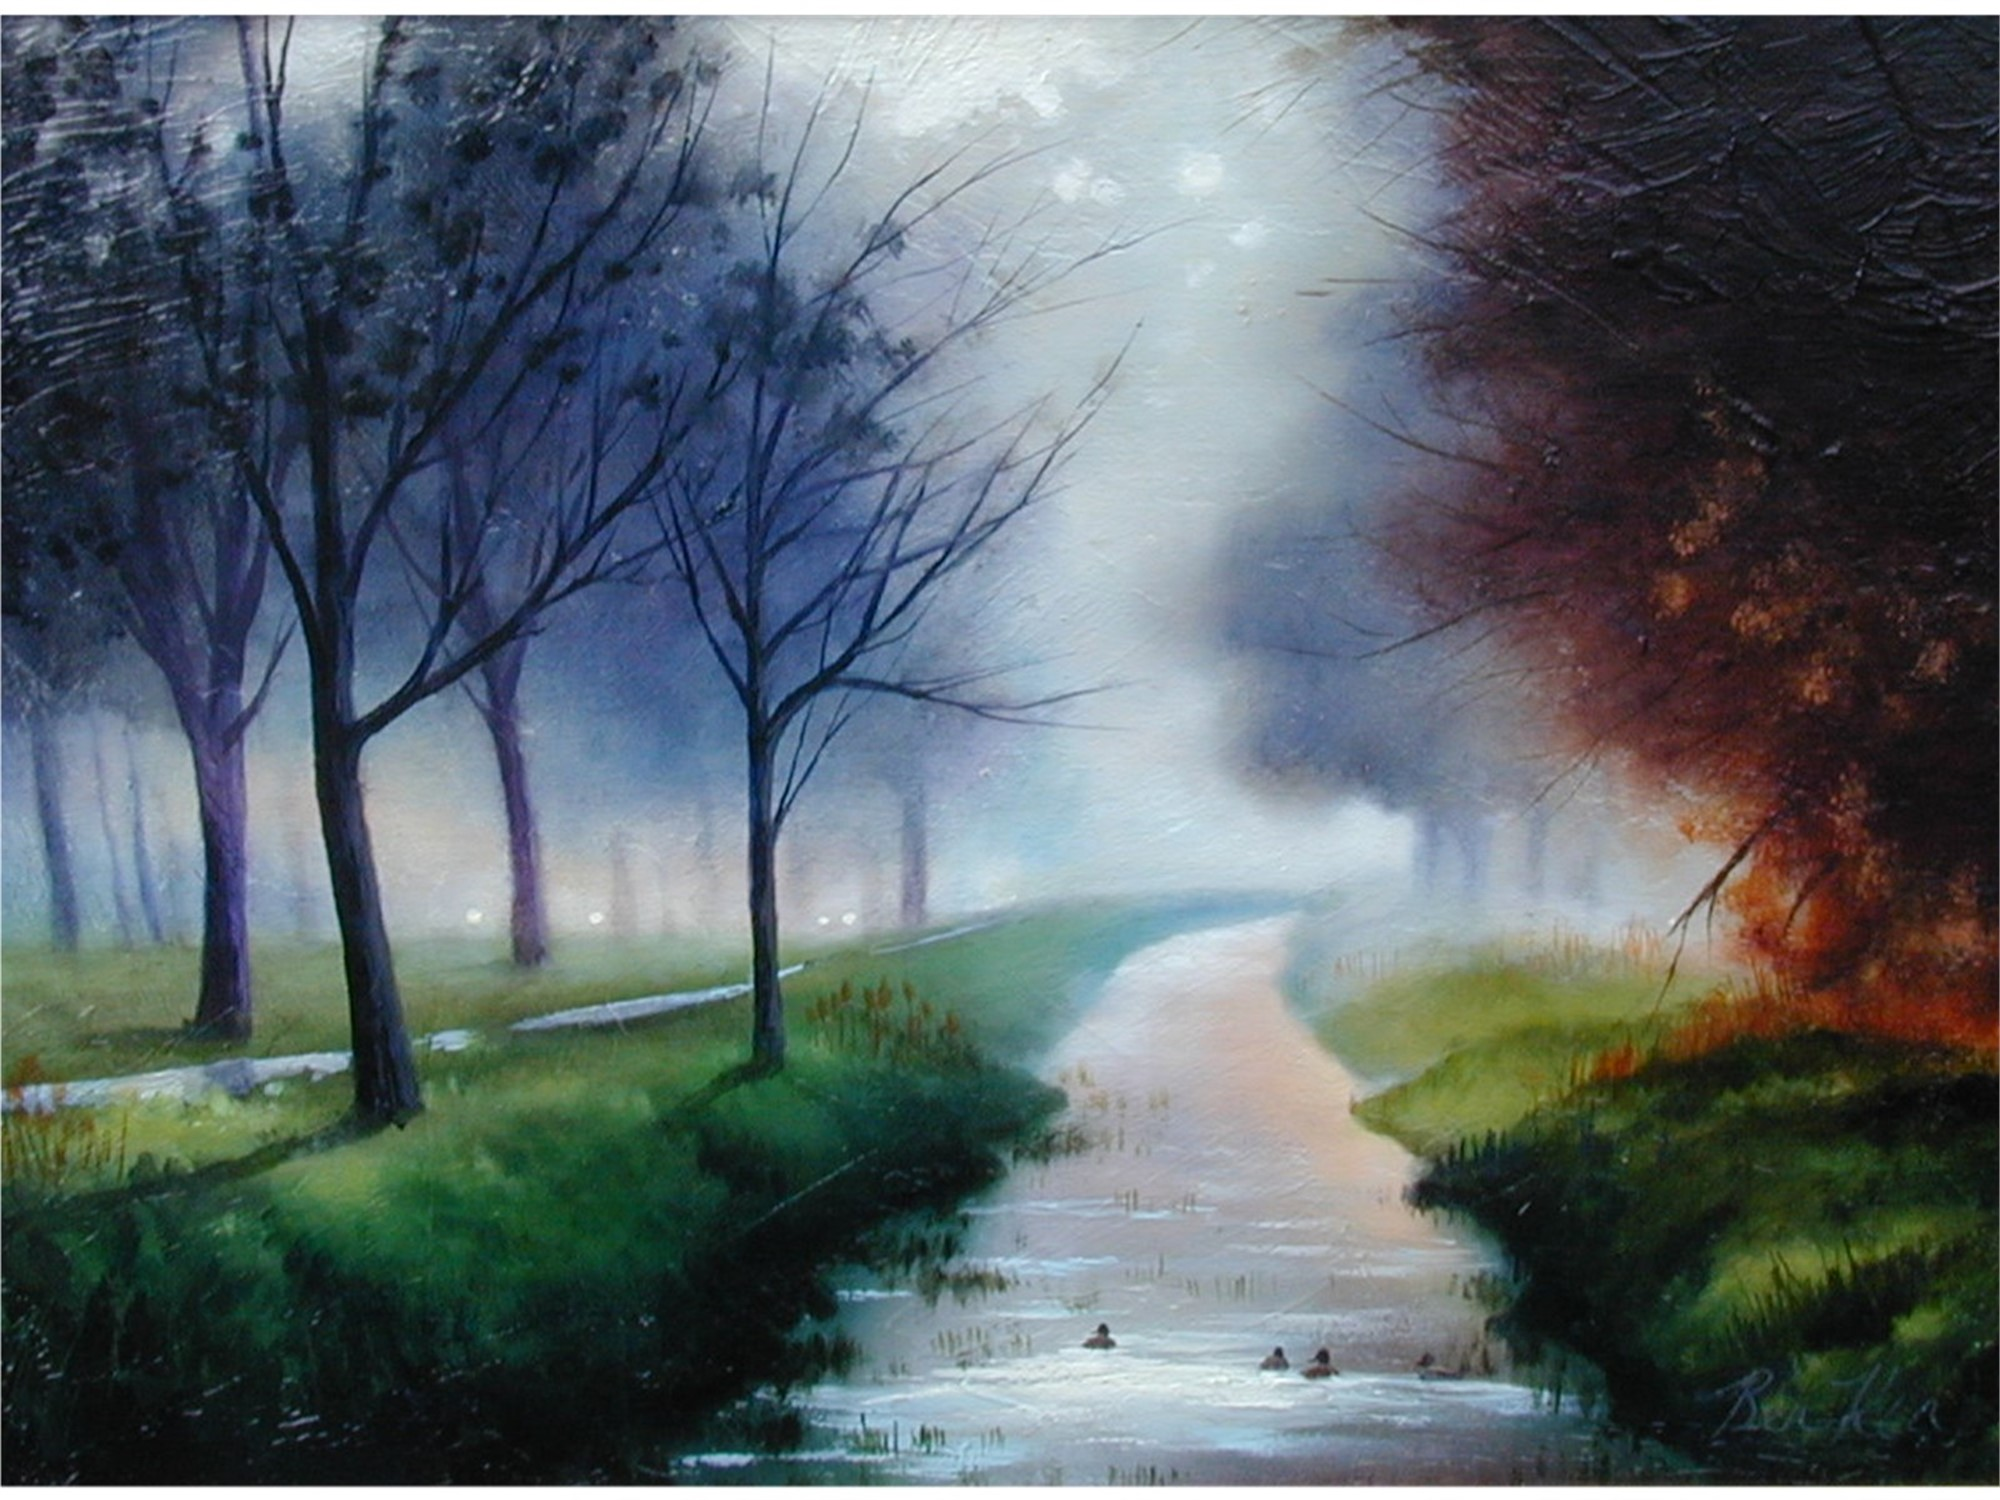 Silence by Ben Rea